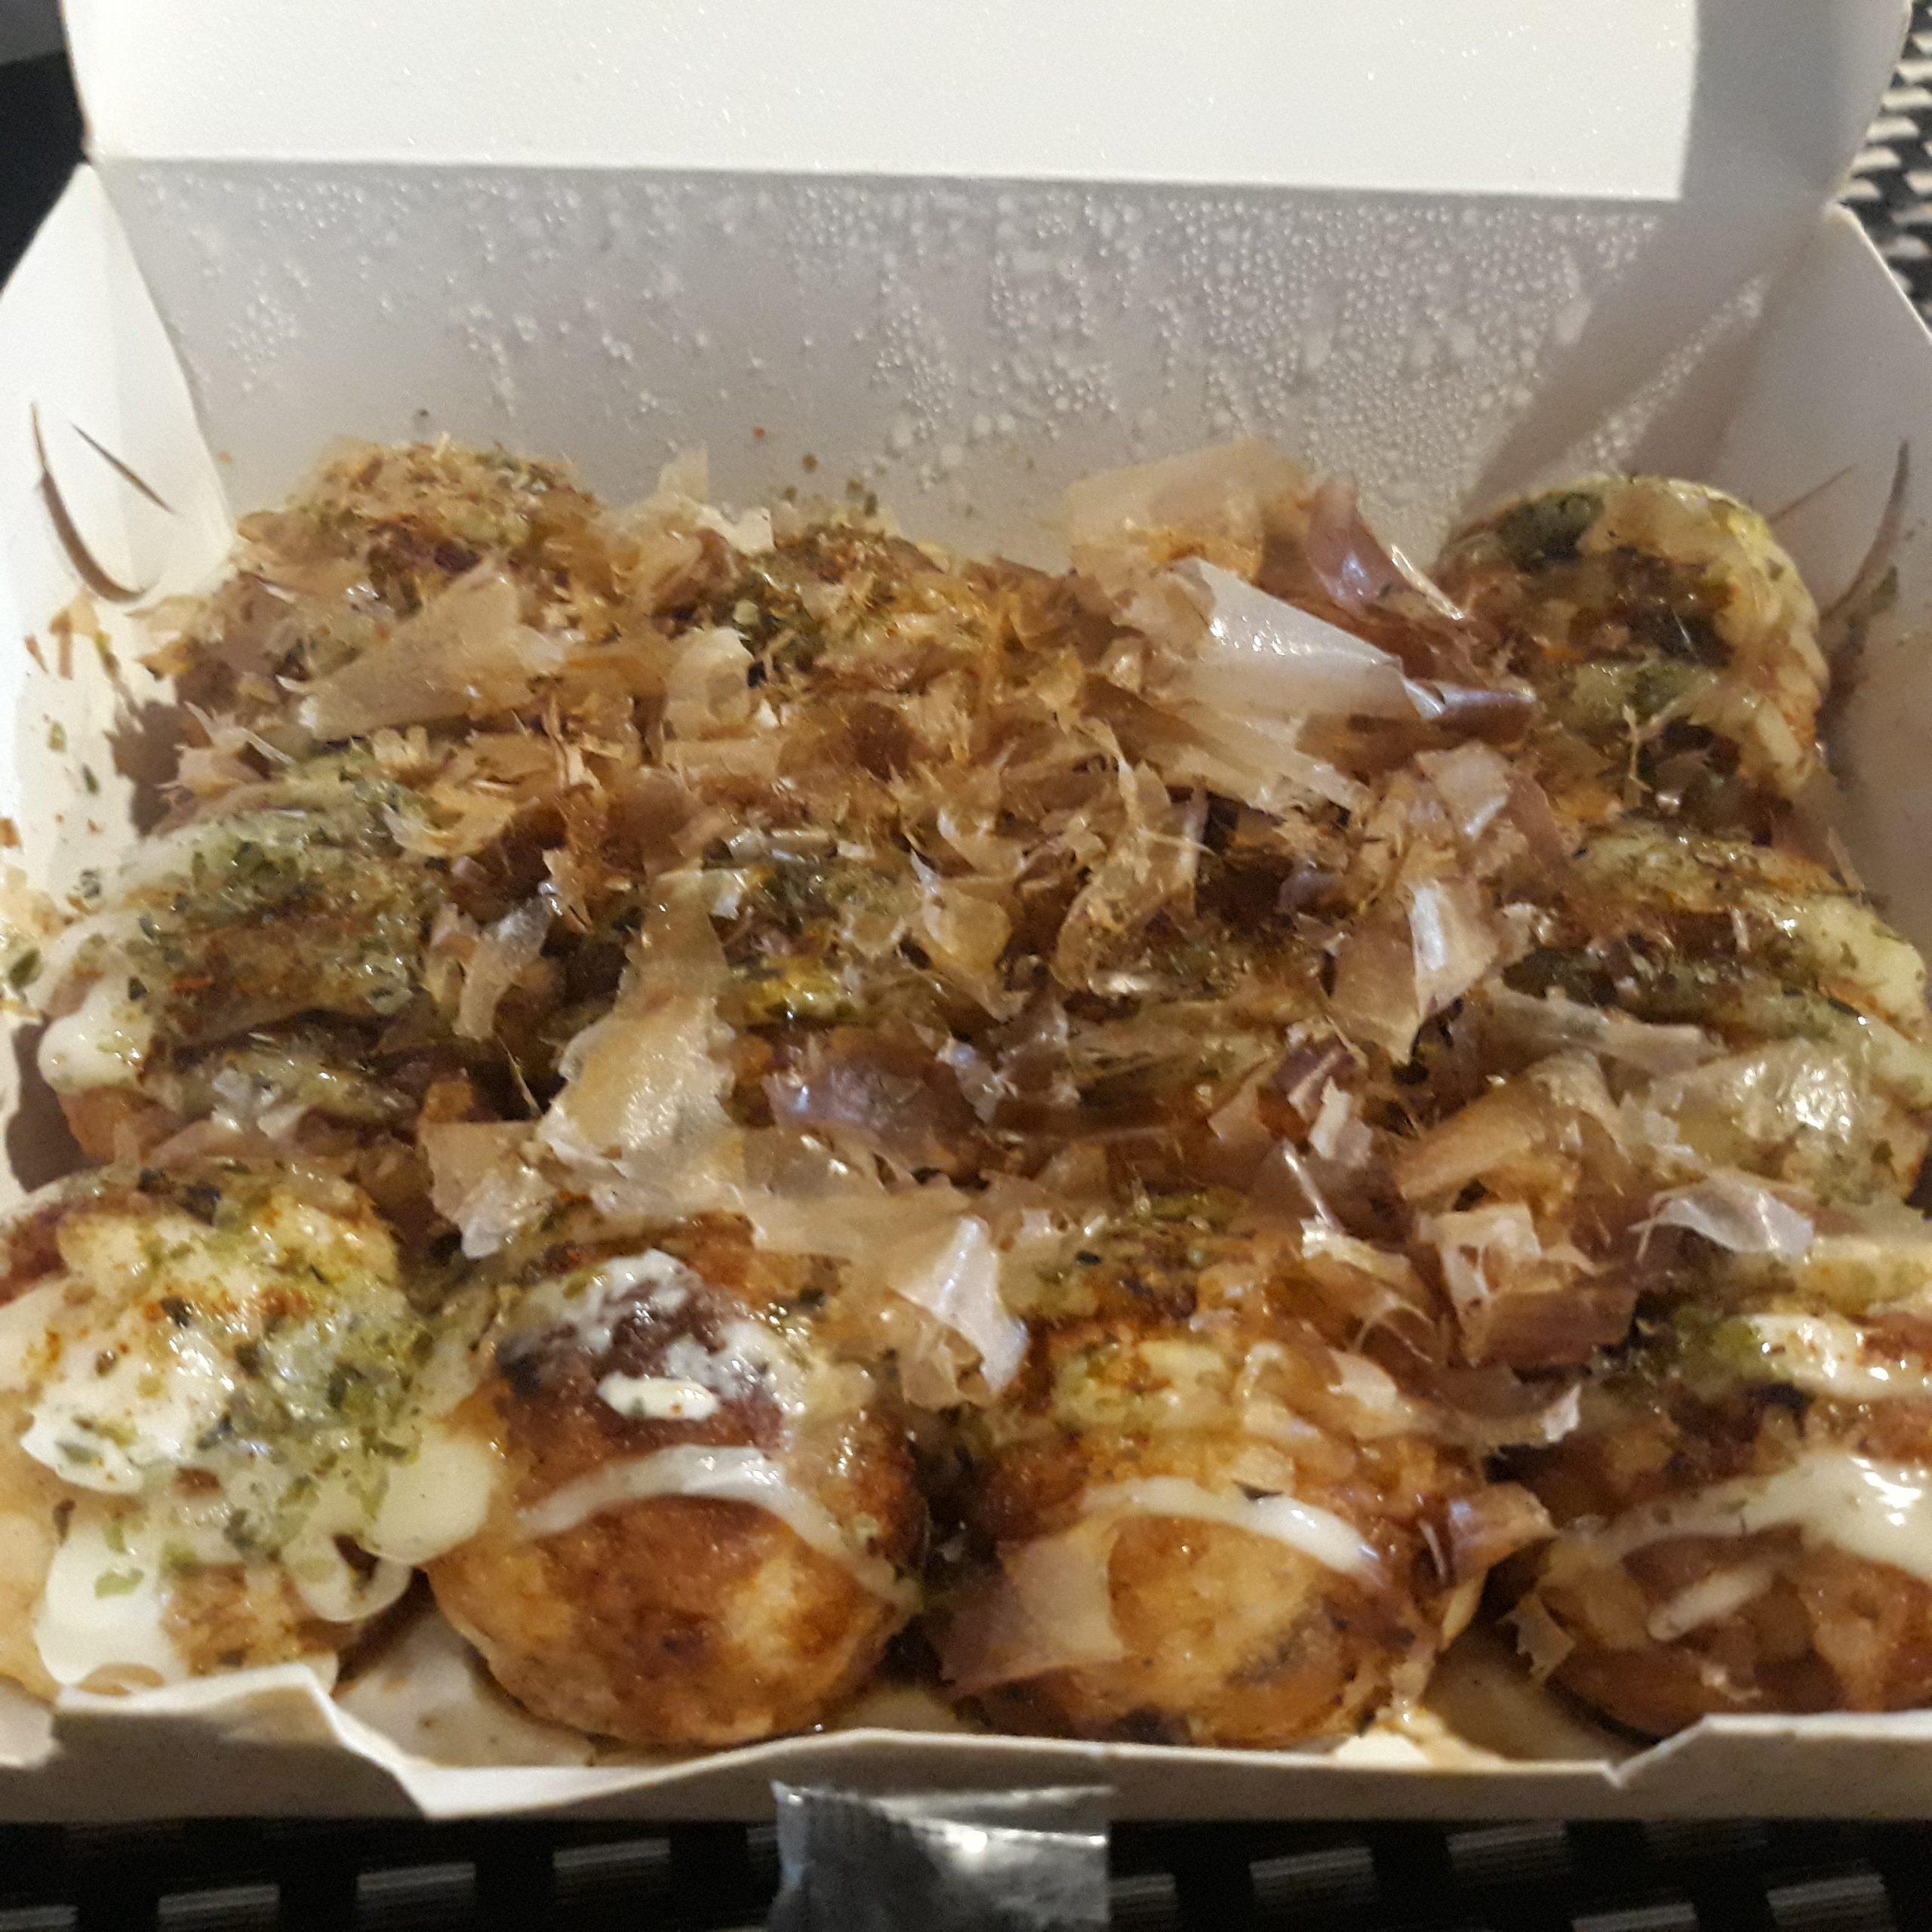 Original flavored takoyaki from Blazing Tentacles.